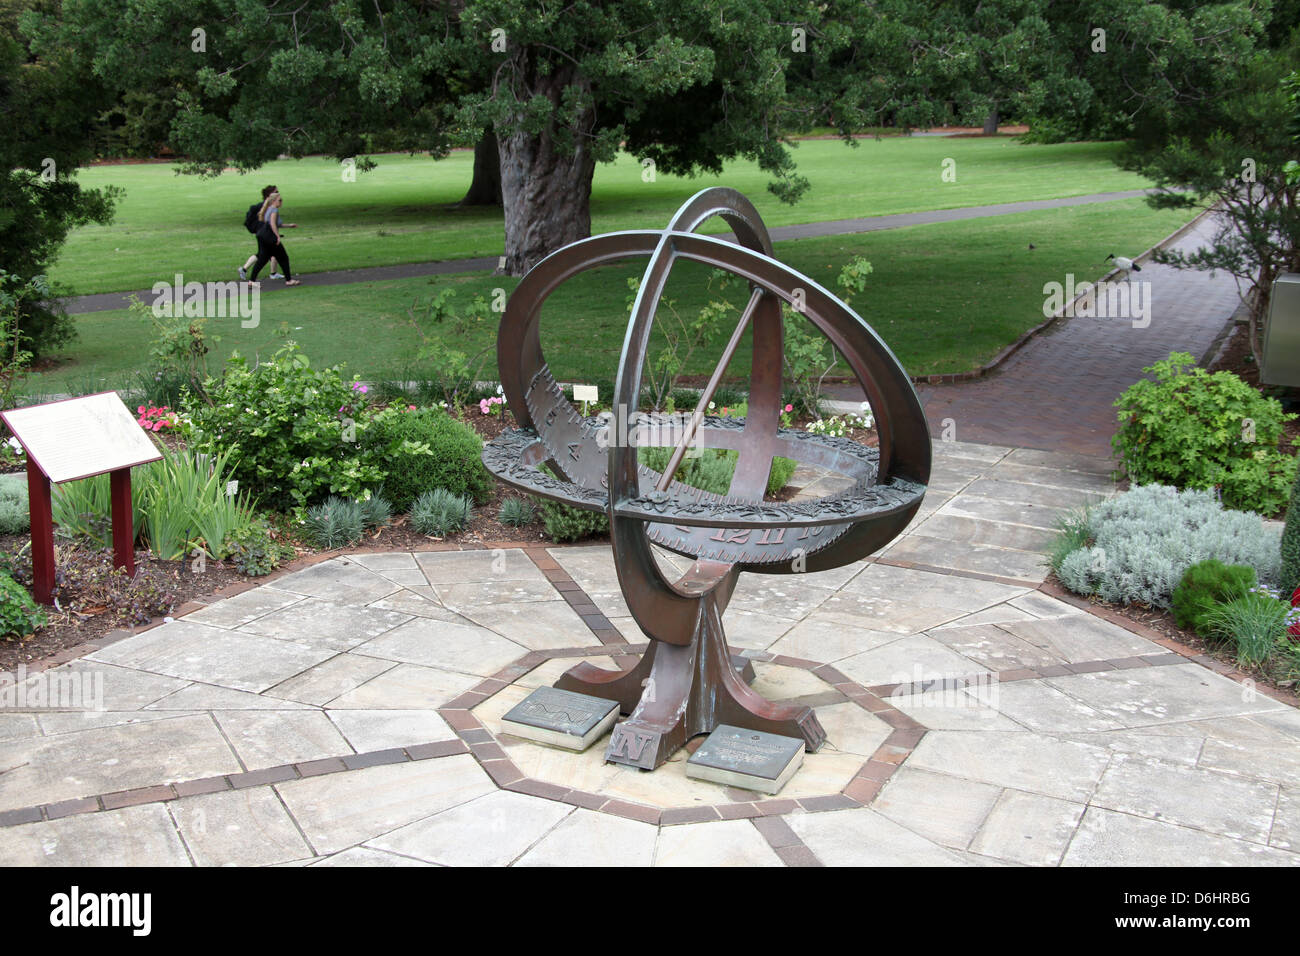 Armillary Sundial In The Herb Garden Of The Royal Botanic Gardens Of Sydney